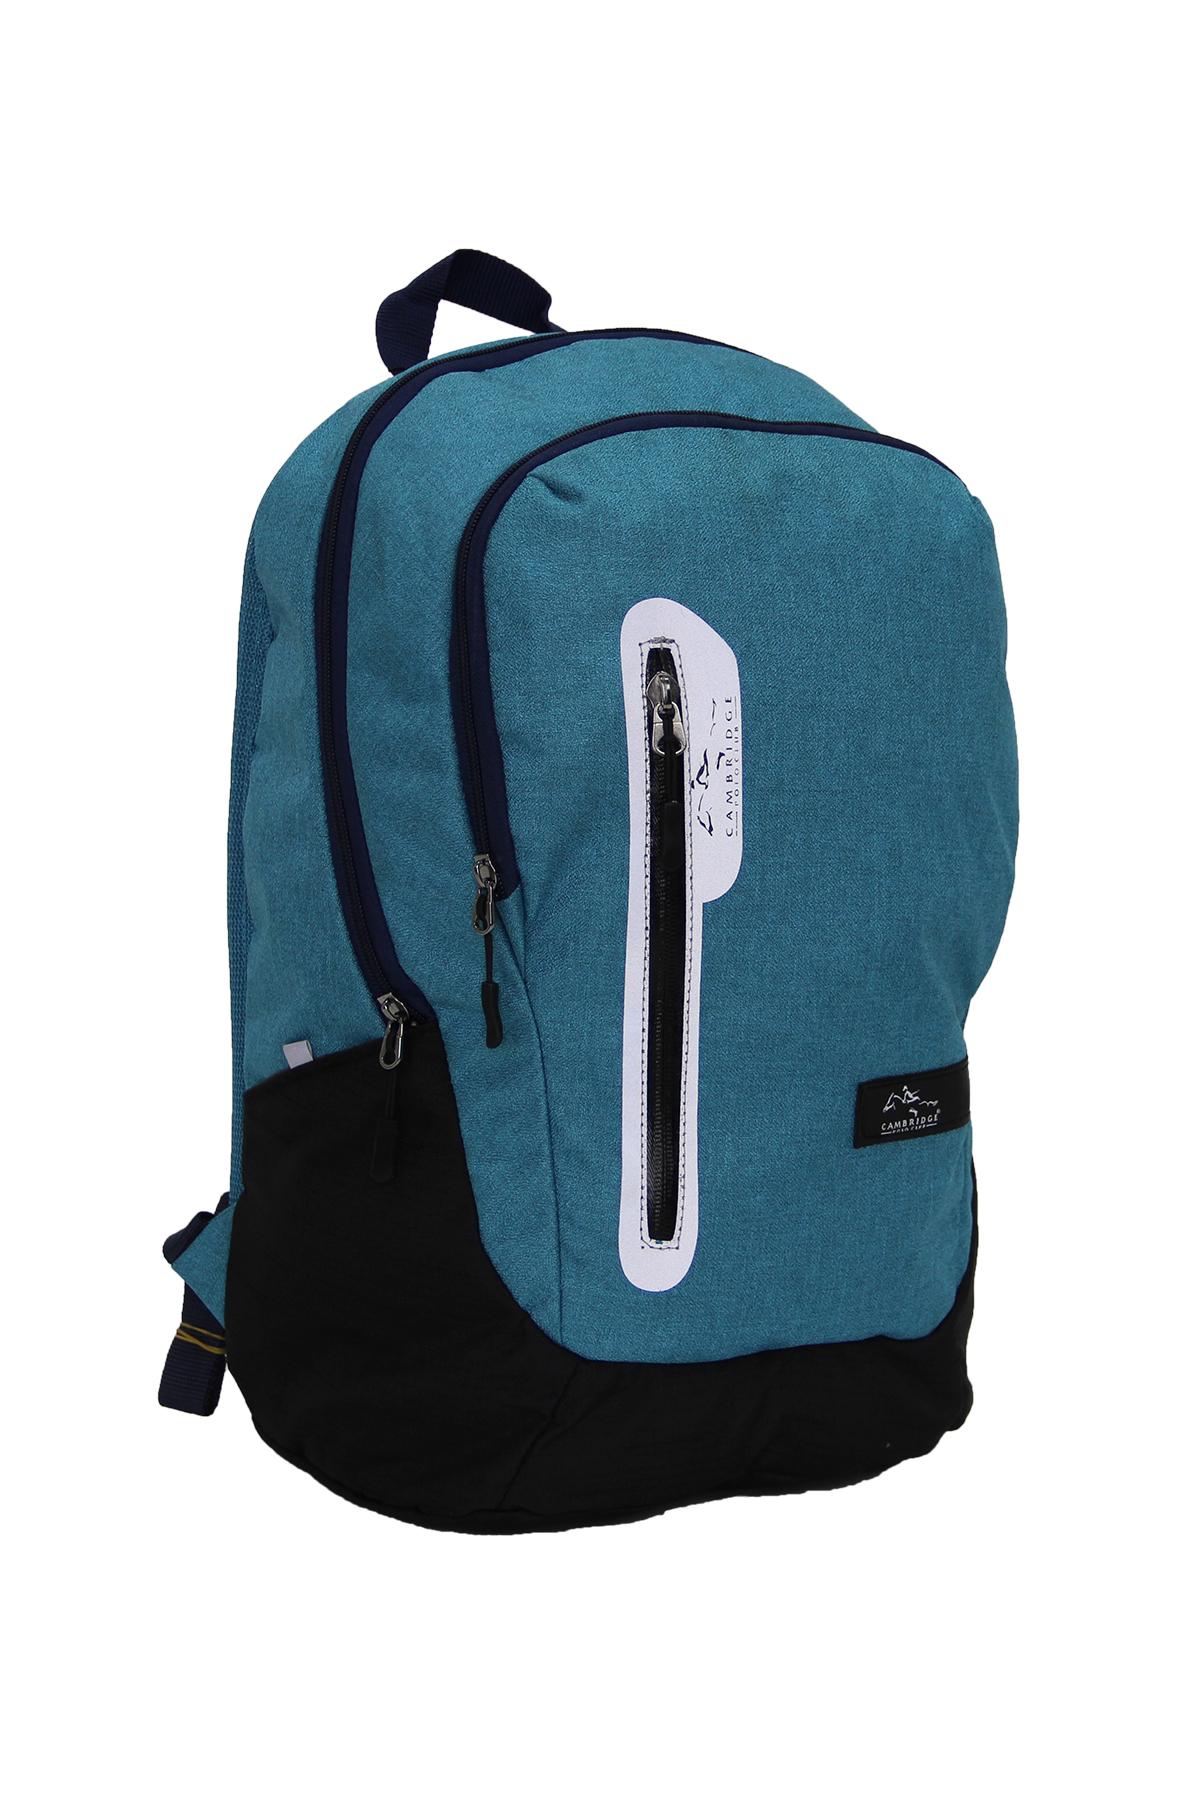 Cambridge Polo Club Multicolored Backpacks (19-52-53-56-57)